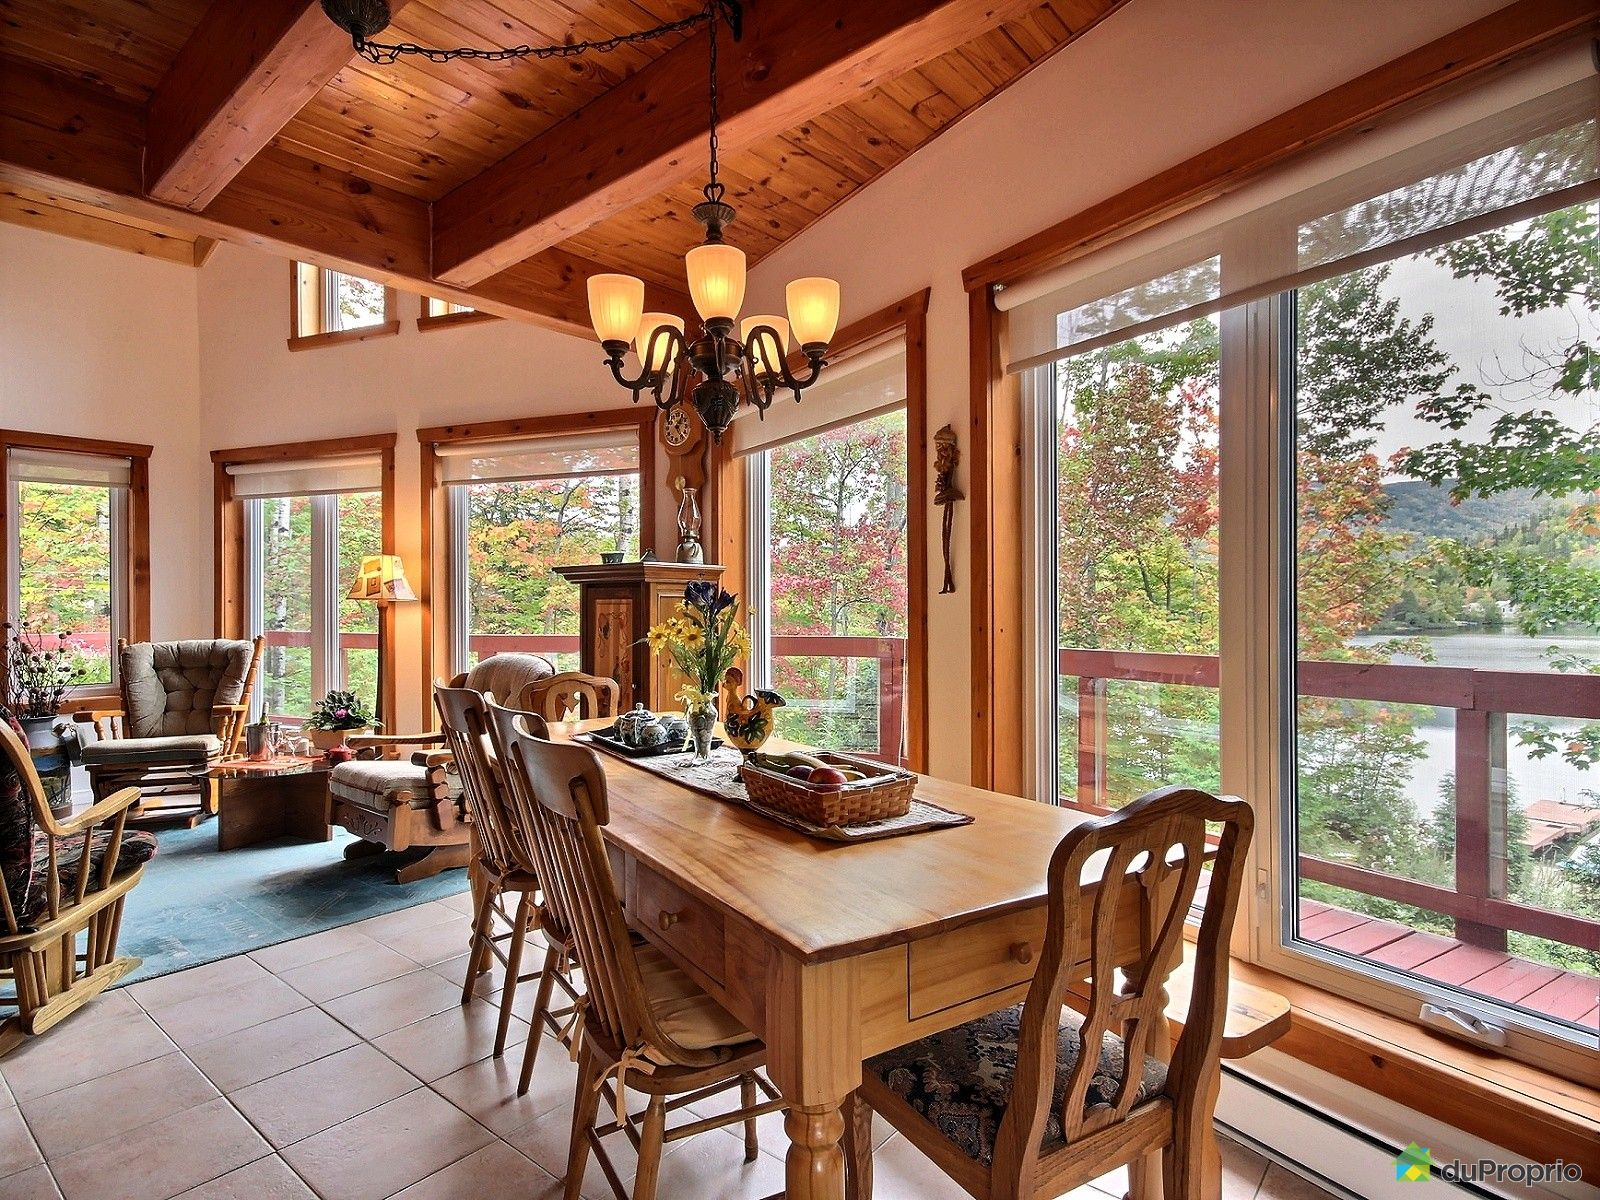 chalet vendre l 39 anse st jean 39 chemin des pins immobilier qu bec duproprio 581588. Black Bedroom Furniture Sets. Home Design Ideas